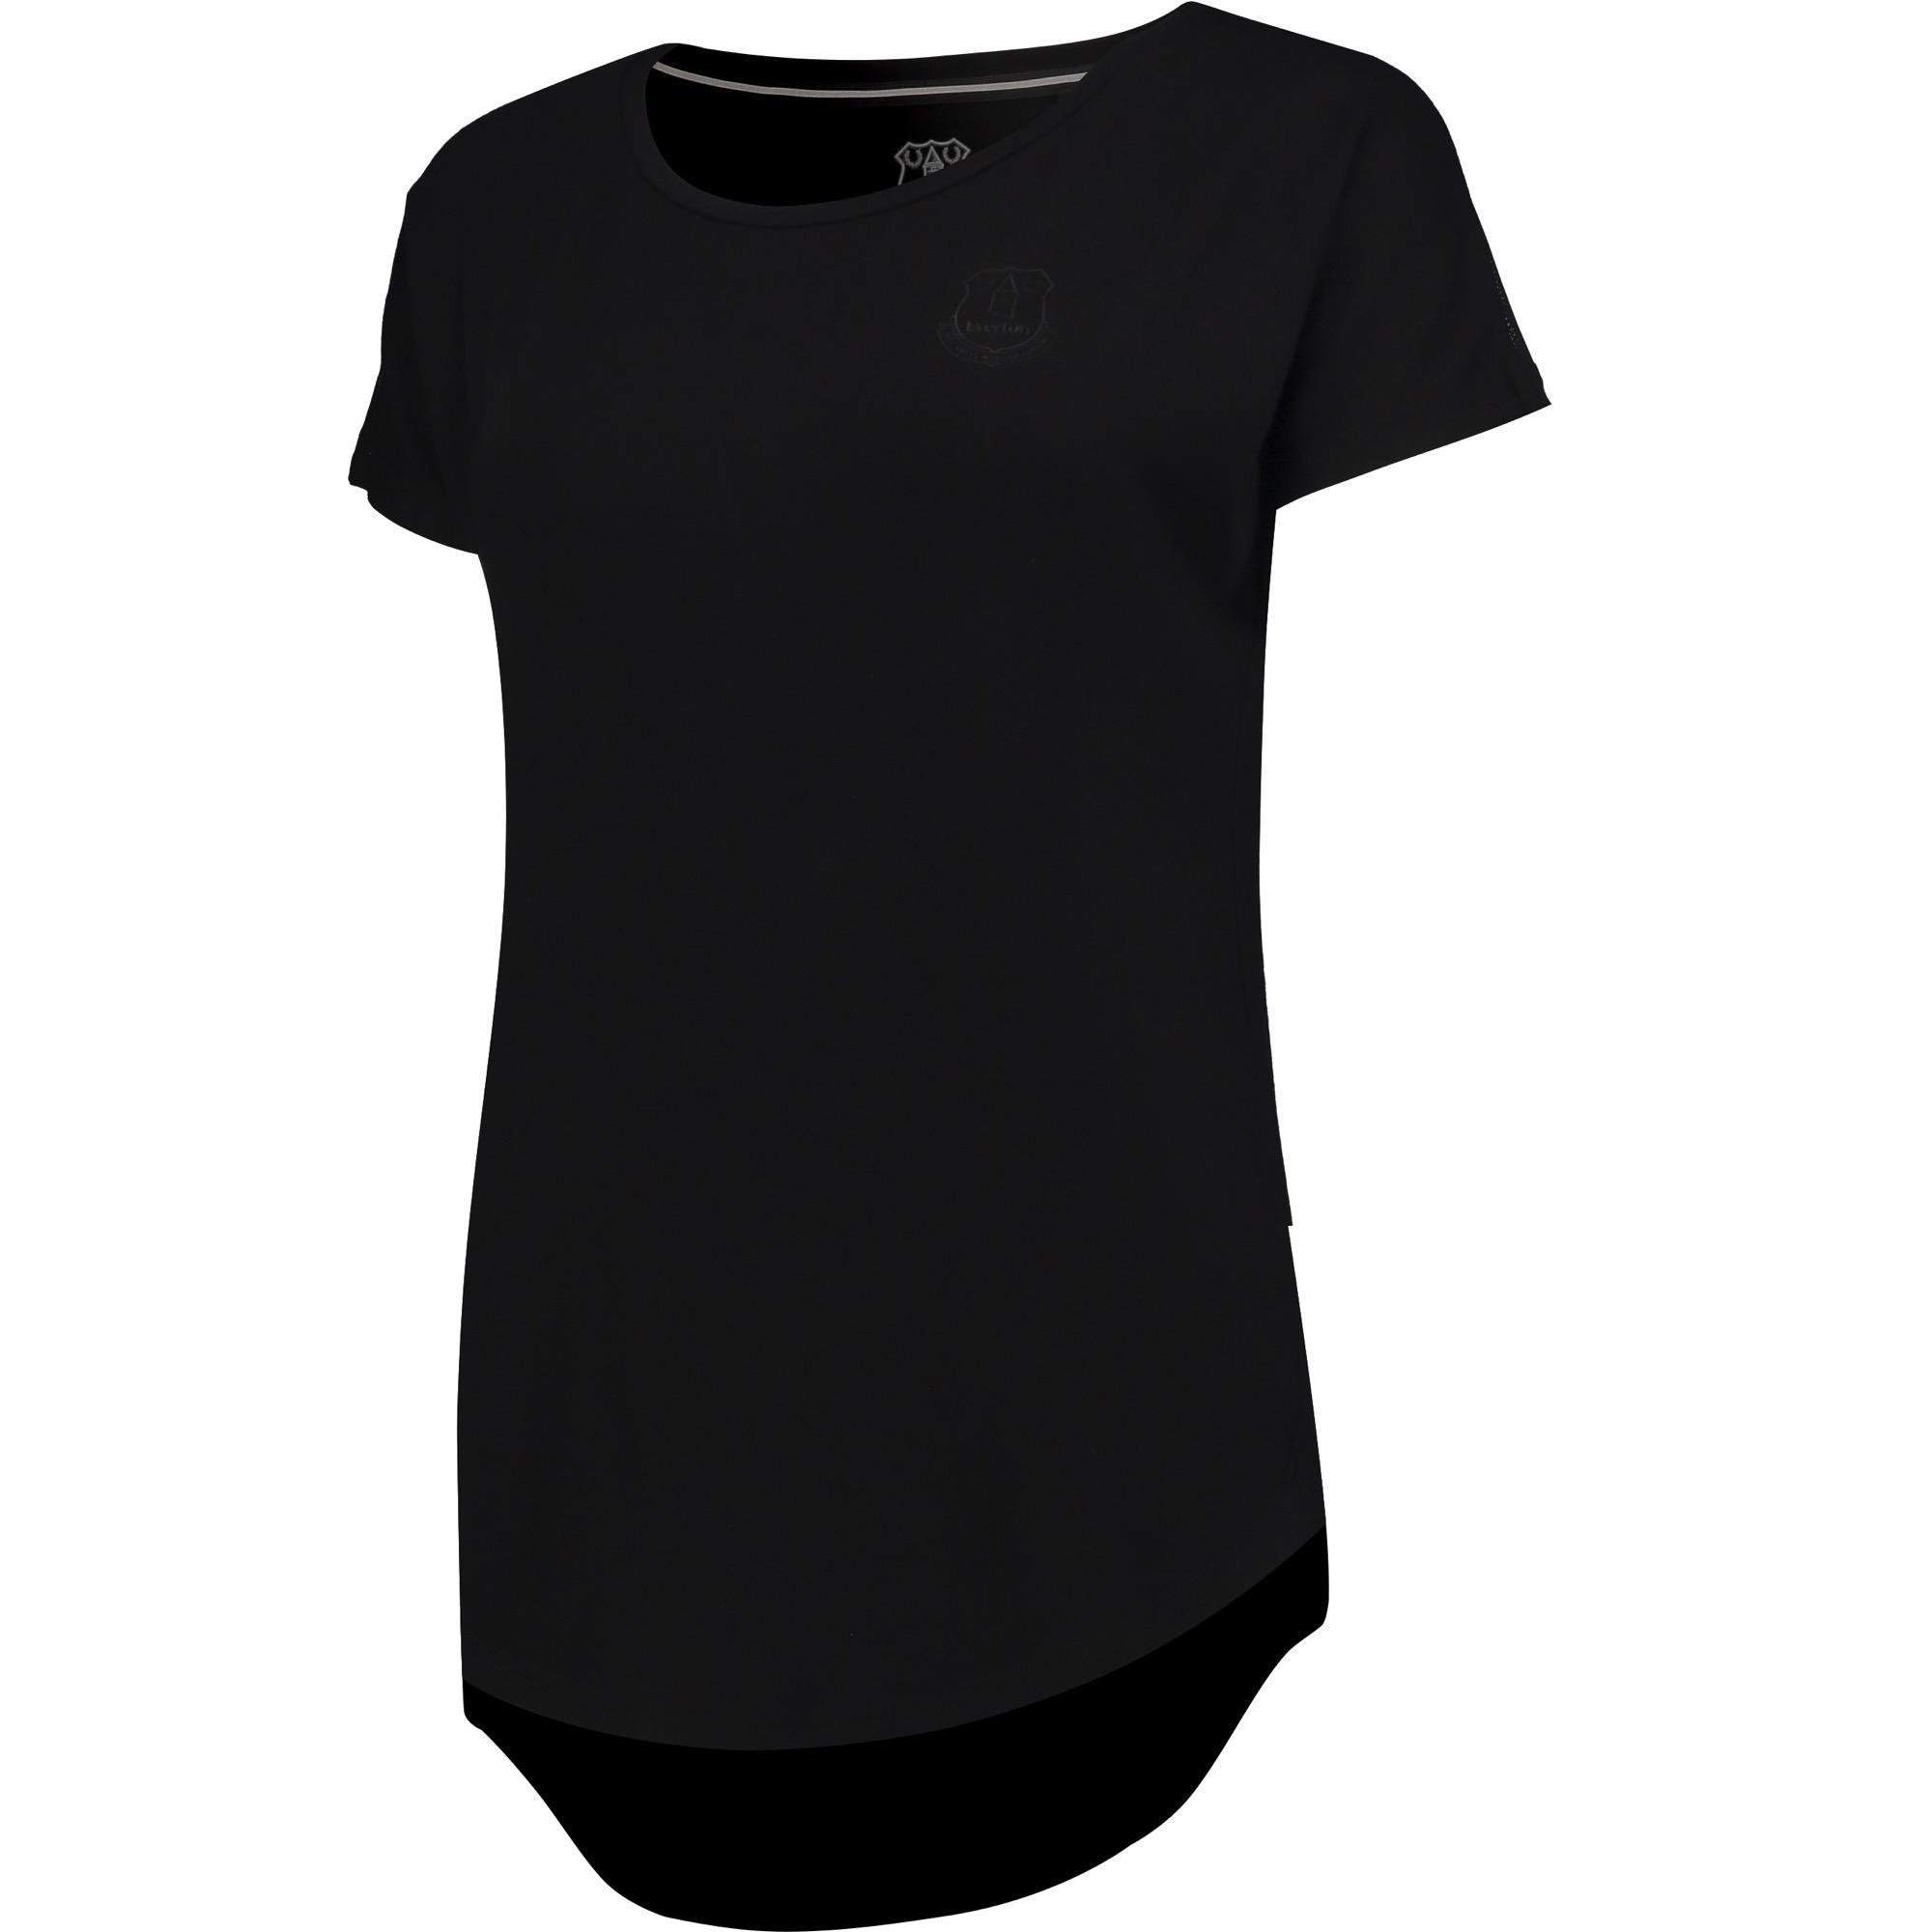 Image of Everton Ath T-Shirt - Black - Womens